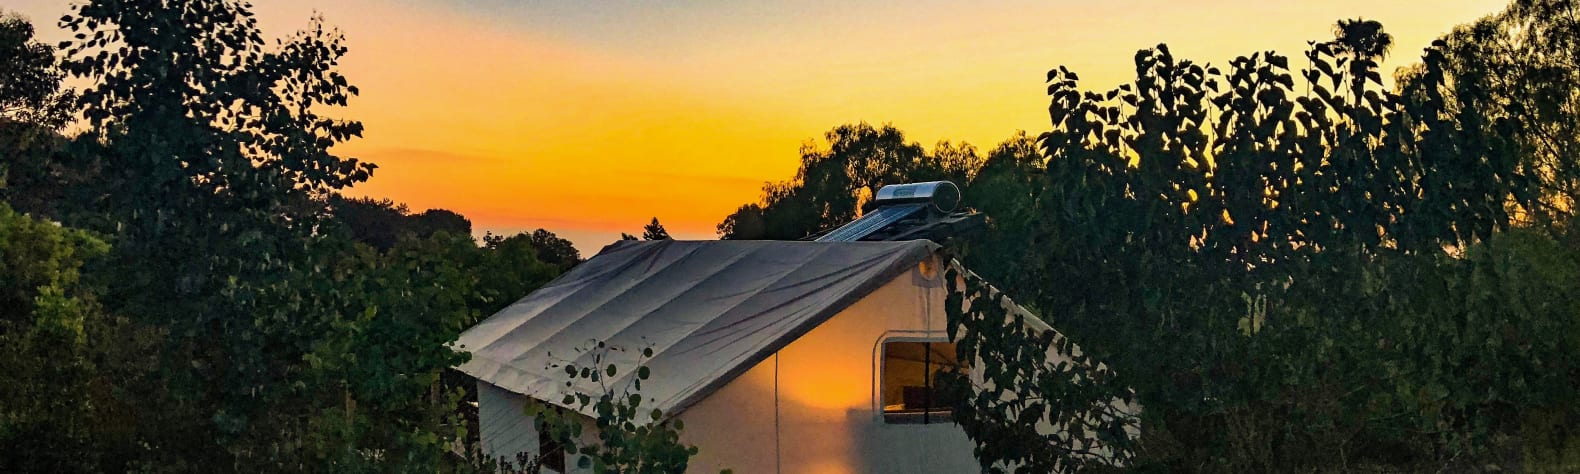 Safari Sunset Eco Glamping